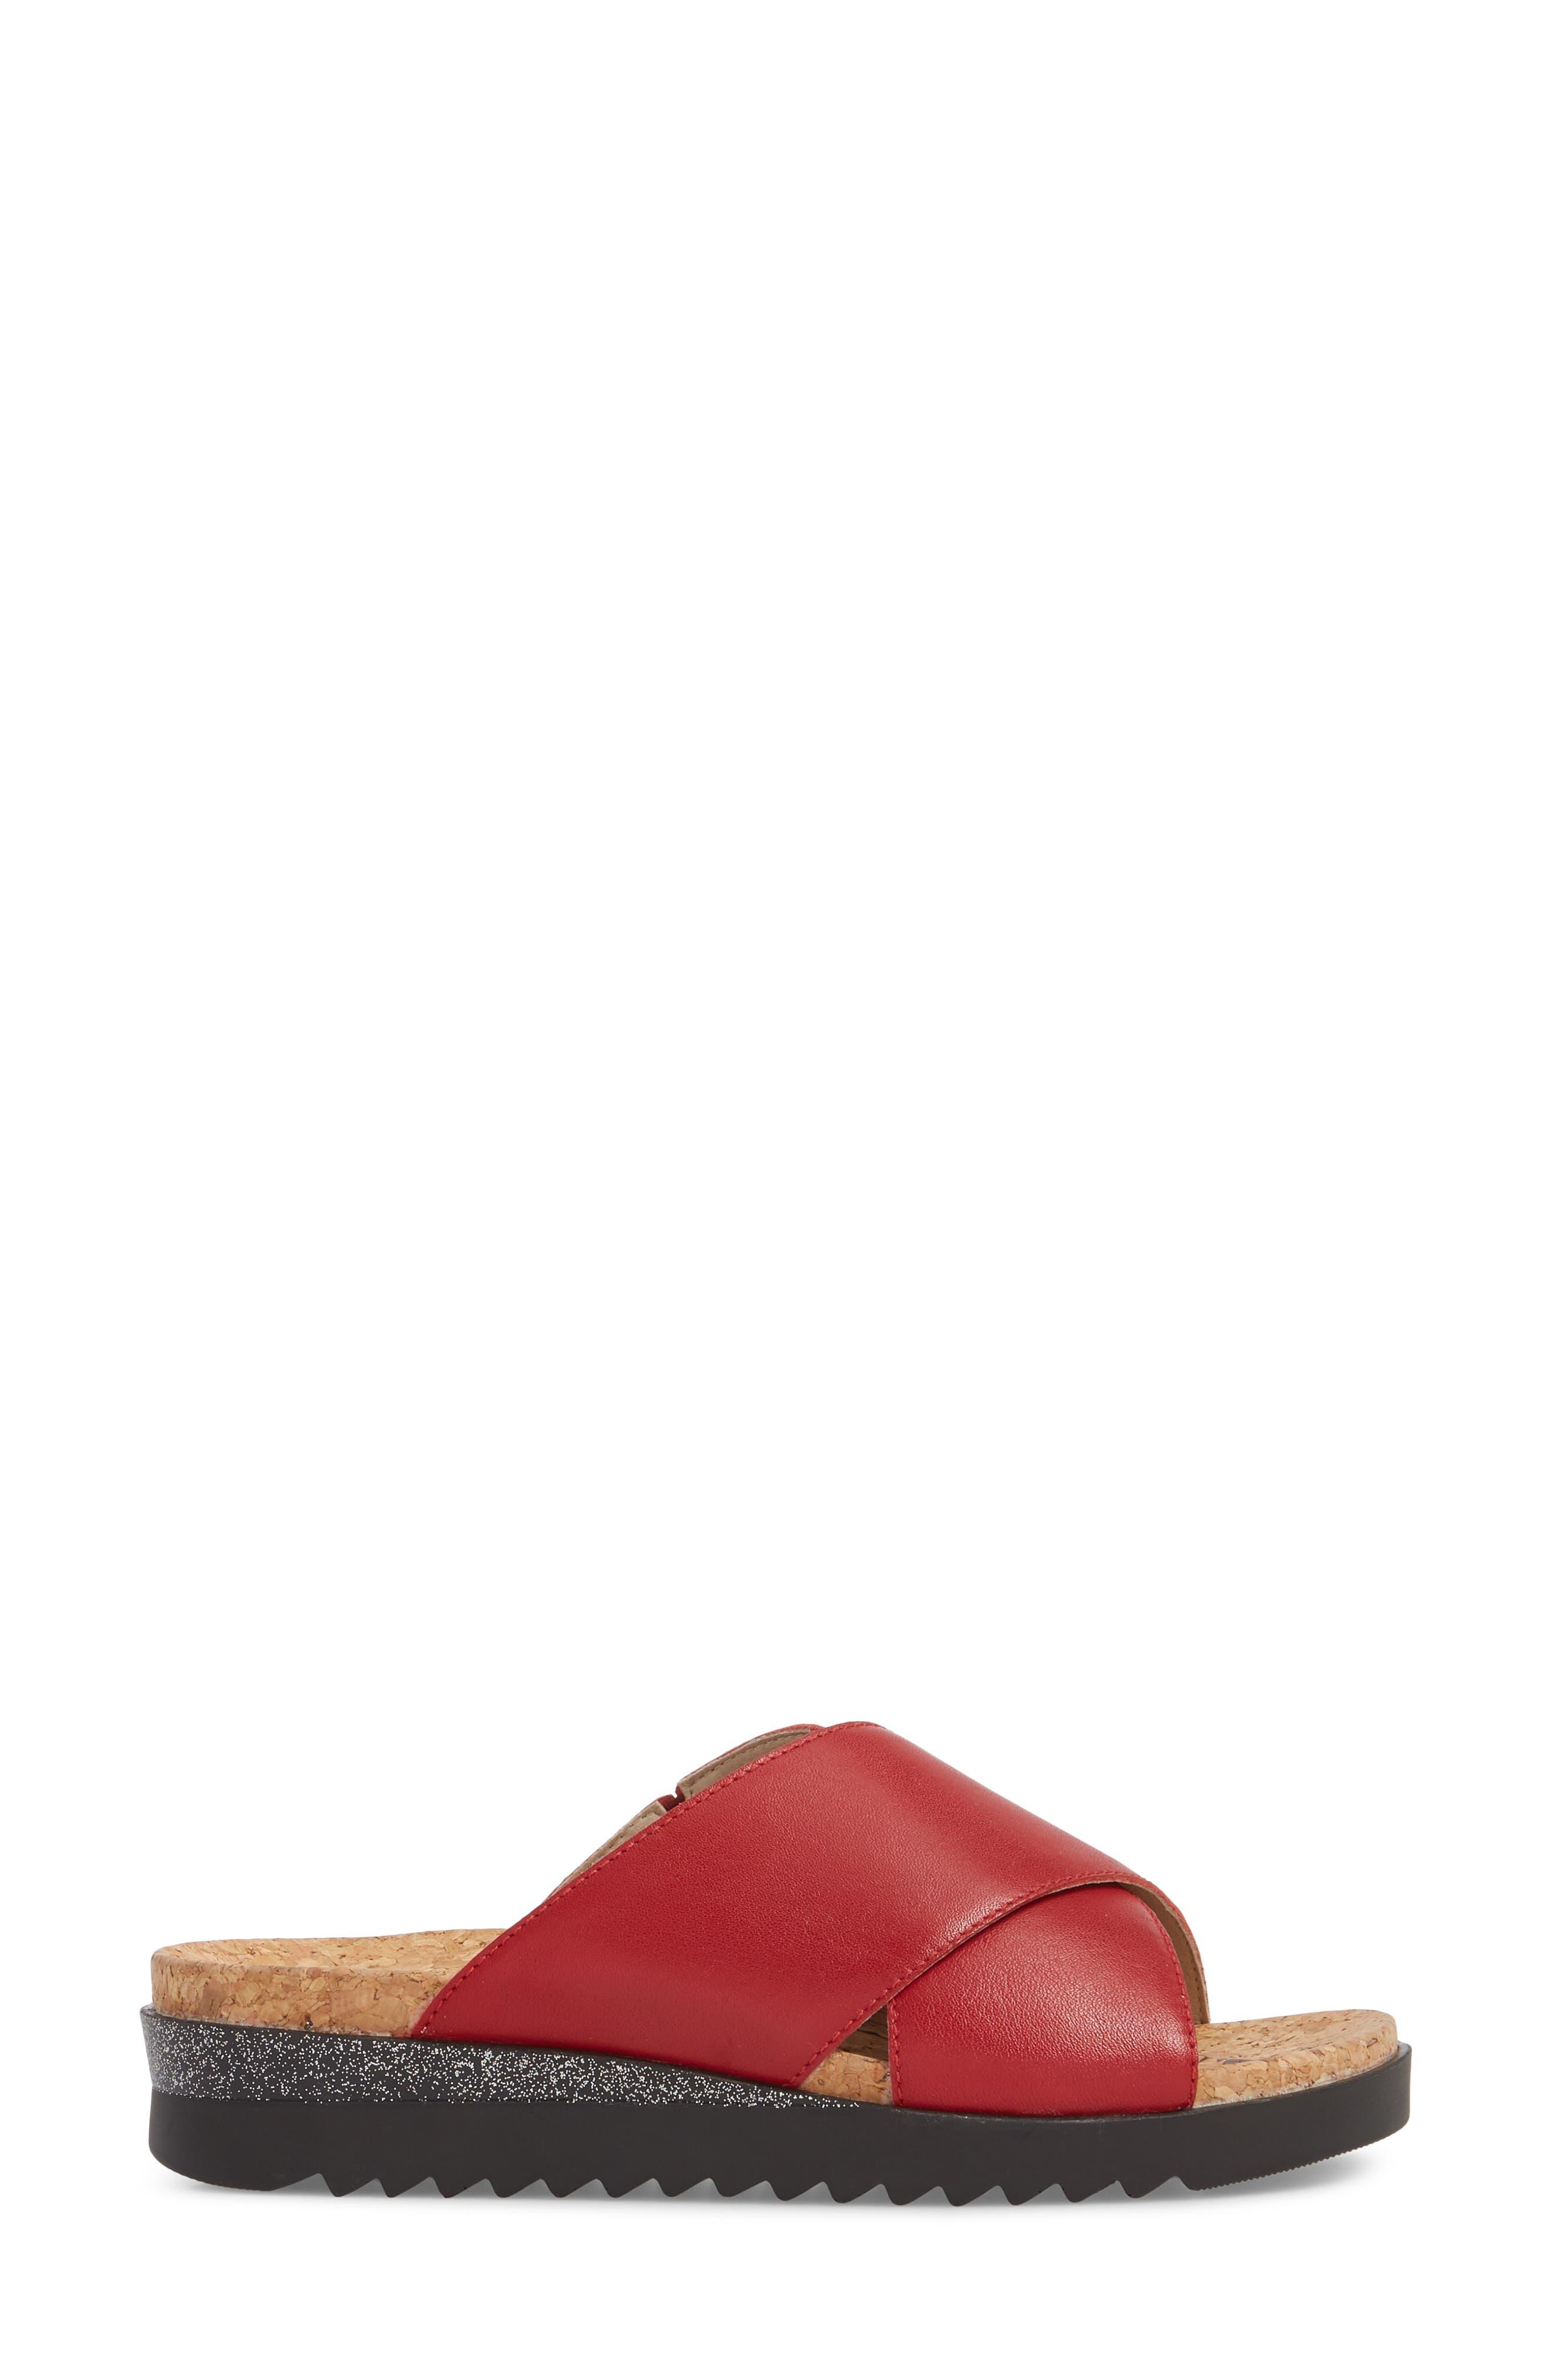 Hollywood 02 Slide Sandal,                             Alternate thumbnail 3, color,                             Red Leather